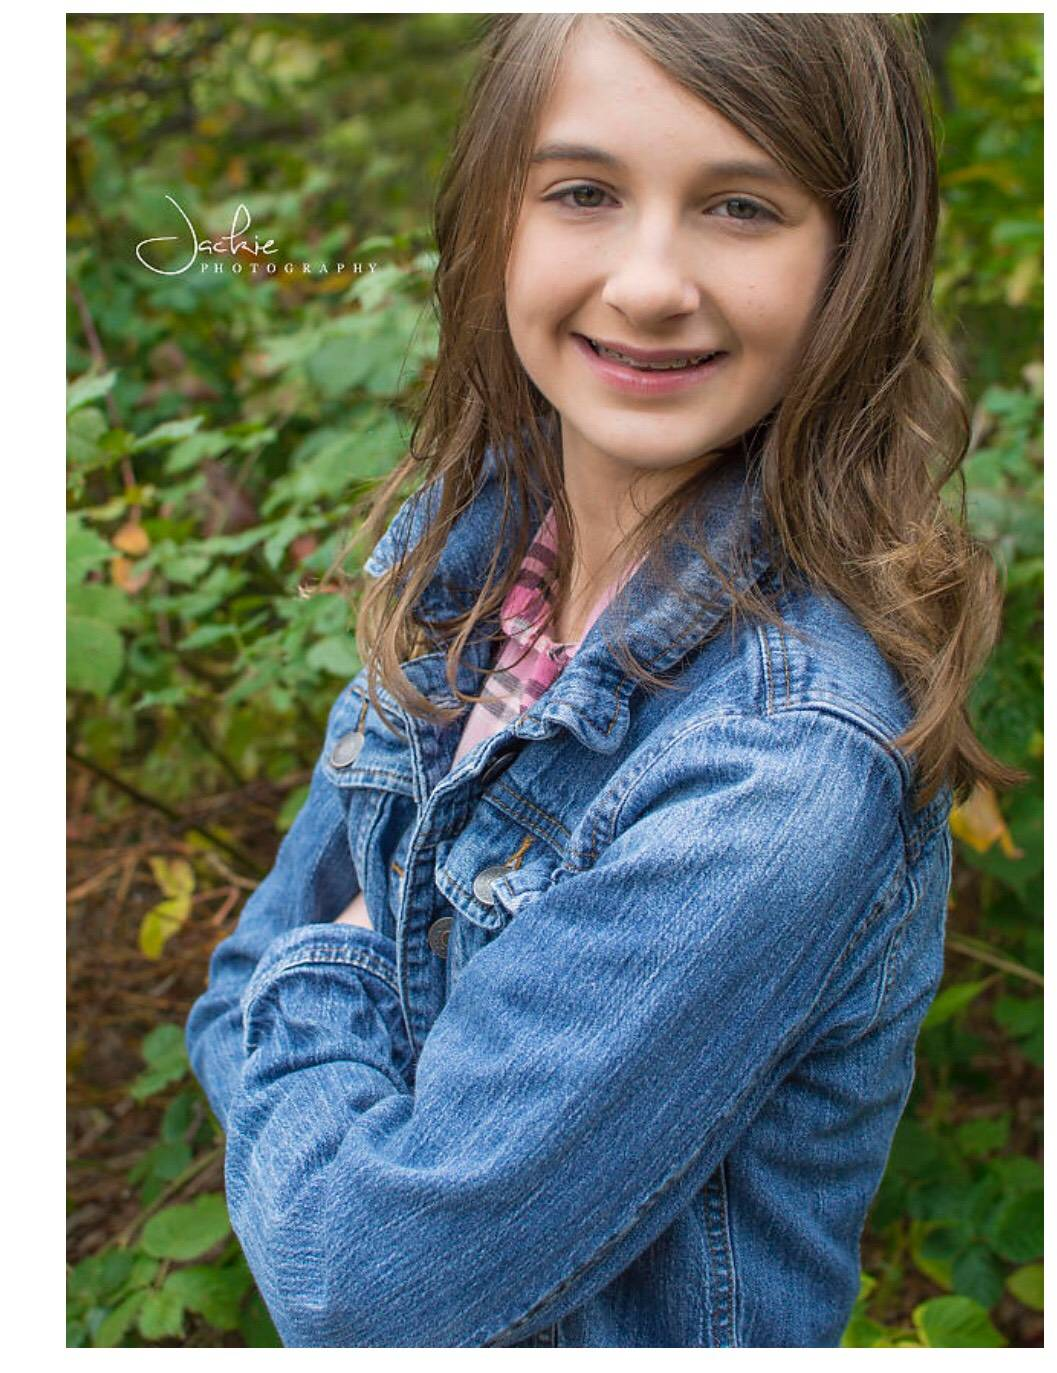 Talent #185,Age 13,Rochester